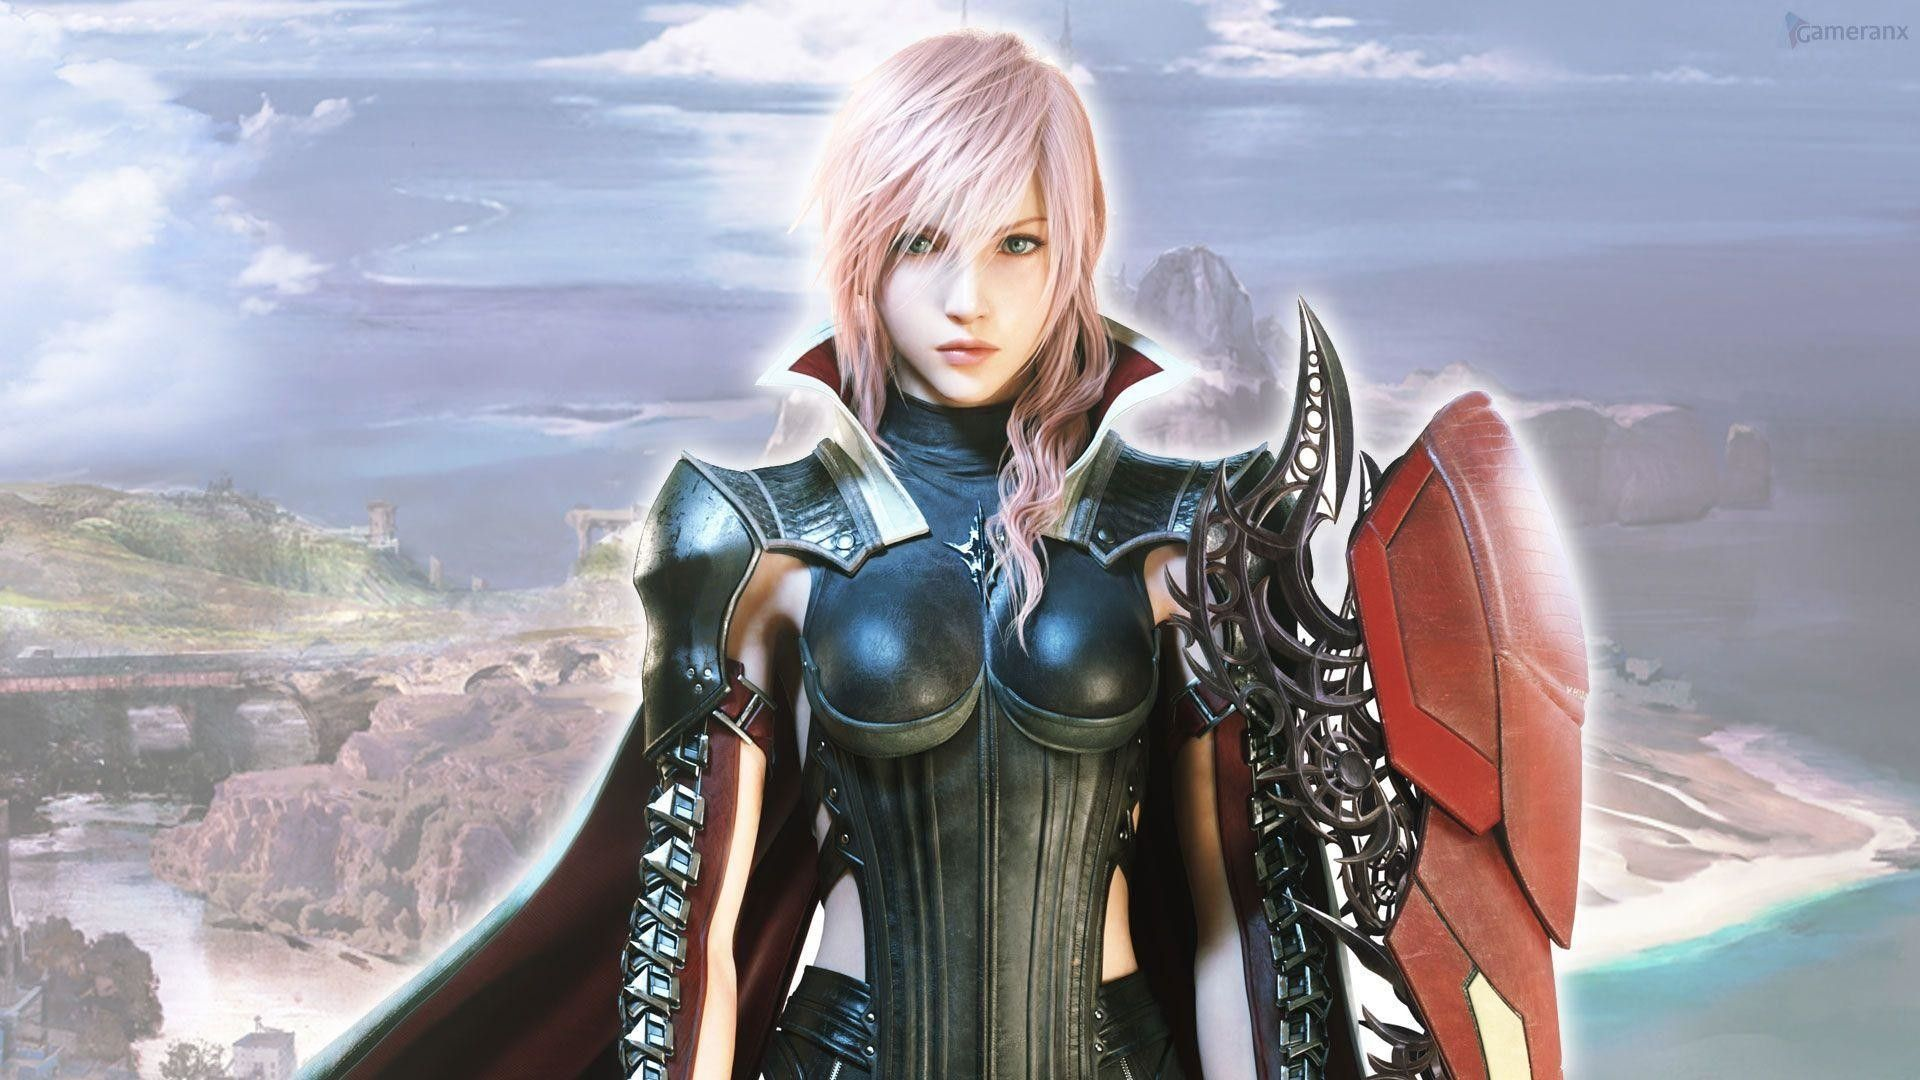 1920x1080 Lightning Returns Final Fantasy XIII Wallpapers